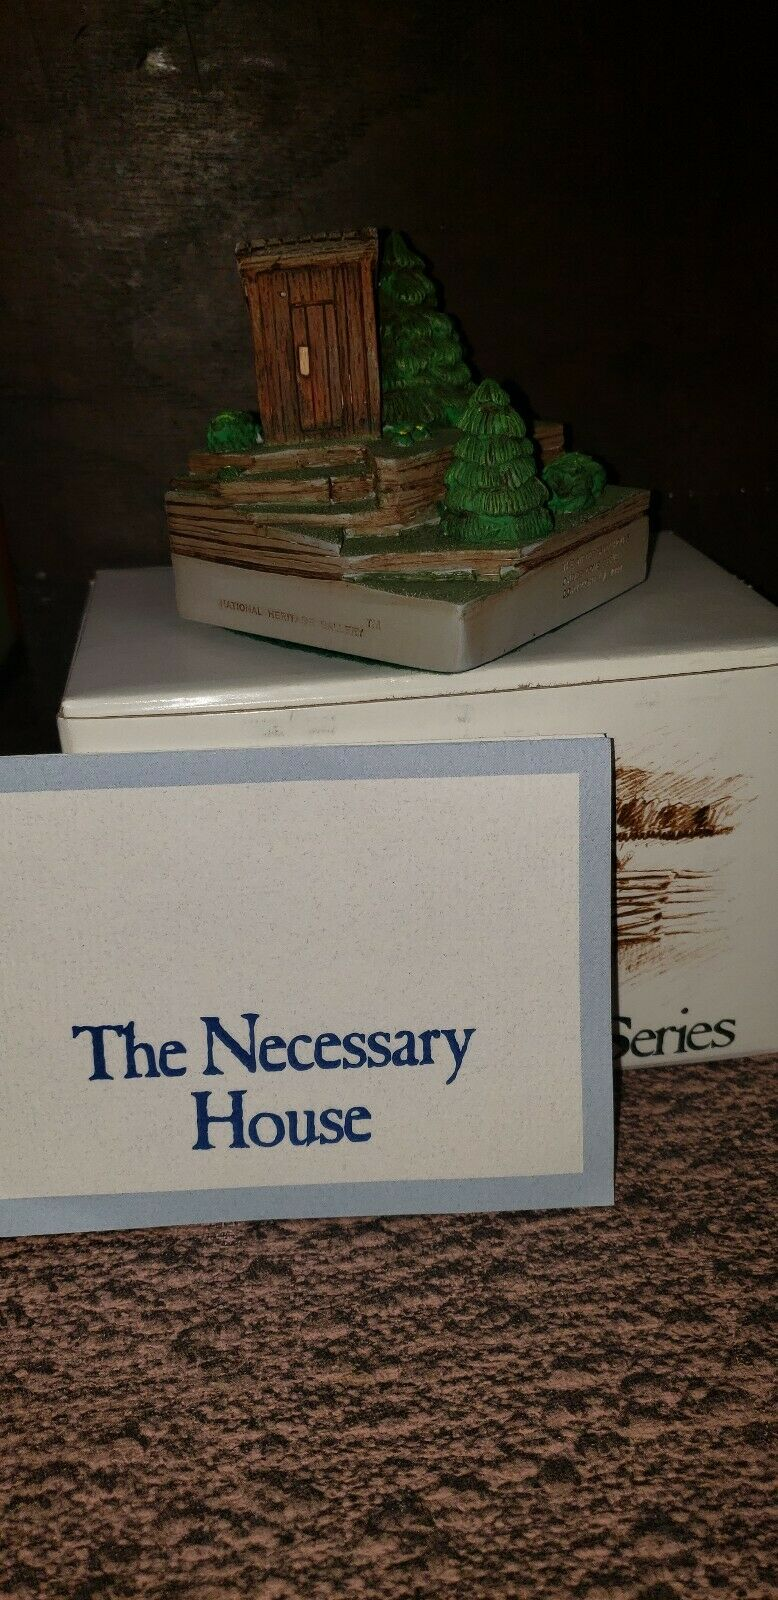 Cades Cove Series  The Necessary House  3500 3500 COA  Boxed